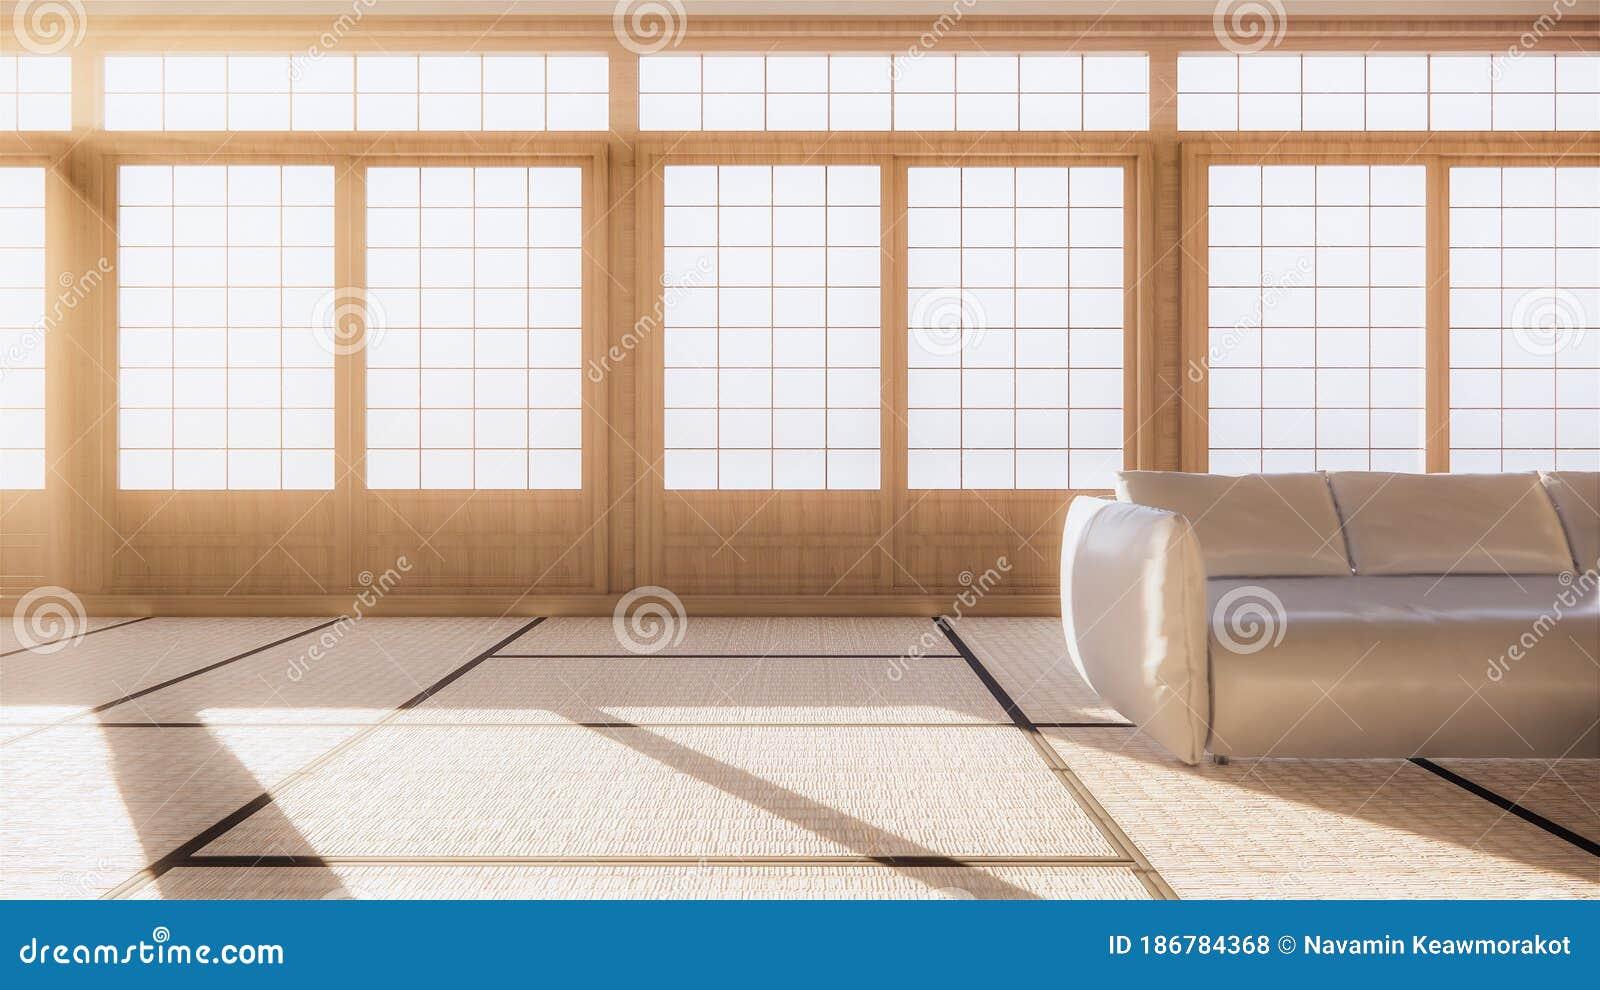 Scene Multi Function Room Ideas Japanese Room Interior Design 3d Rendering Stock Illustration Illustration Of Style Scene 186784368